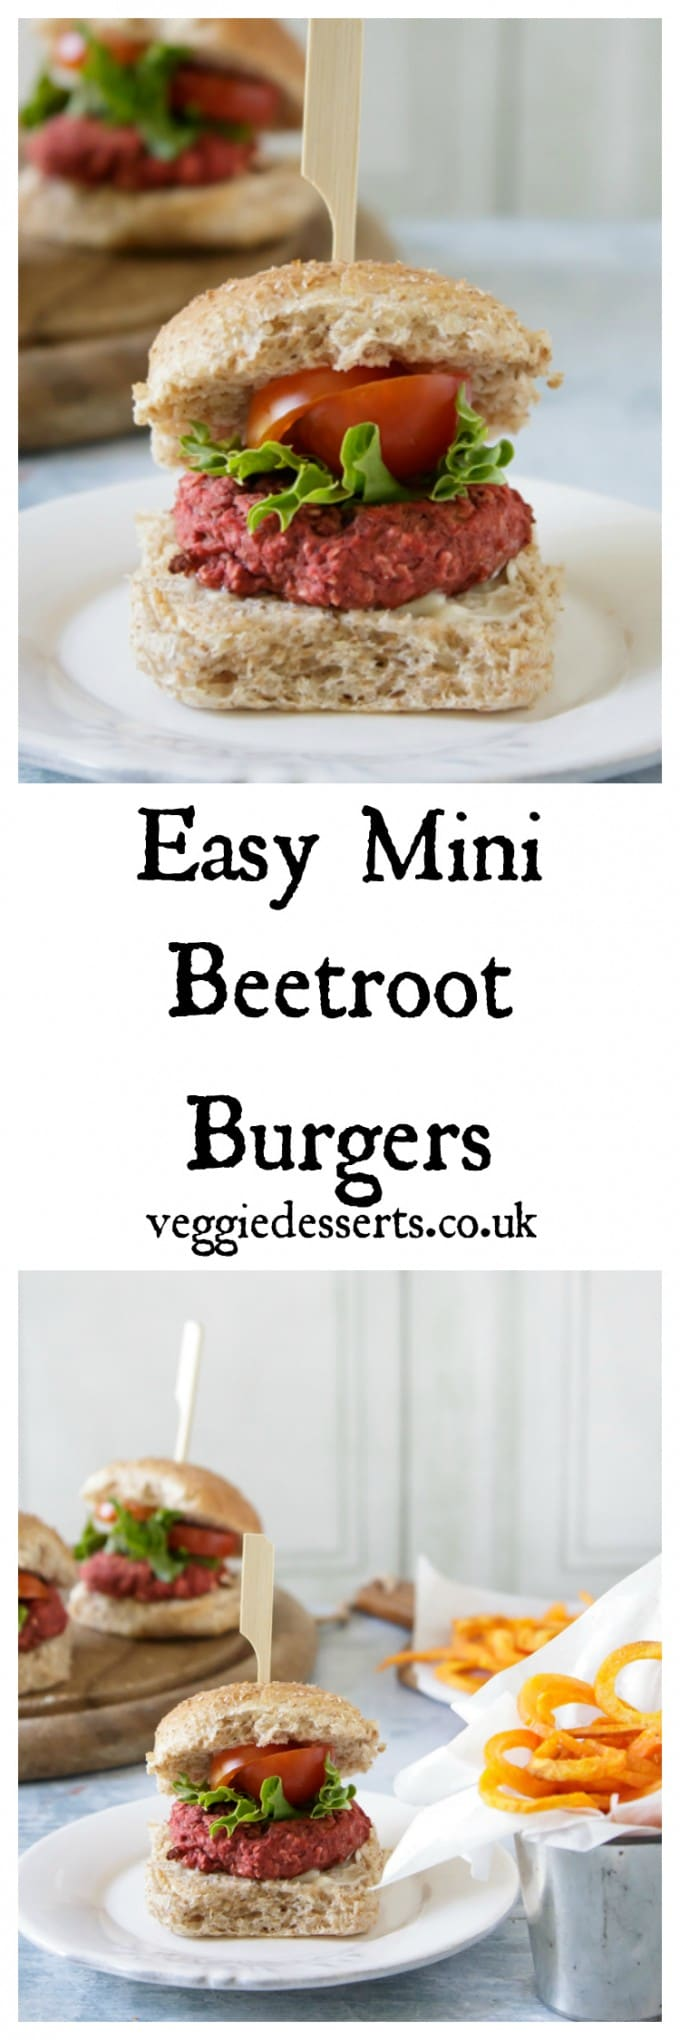 Easy Mini Beetroot Burgers | Veggie Desserts Blog